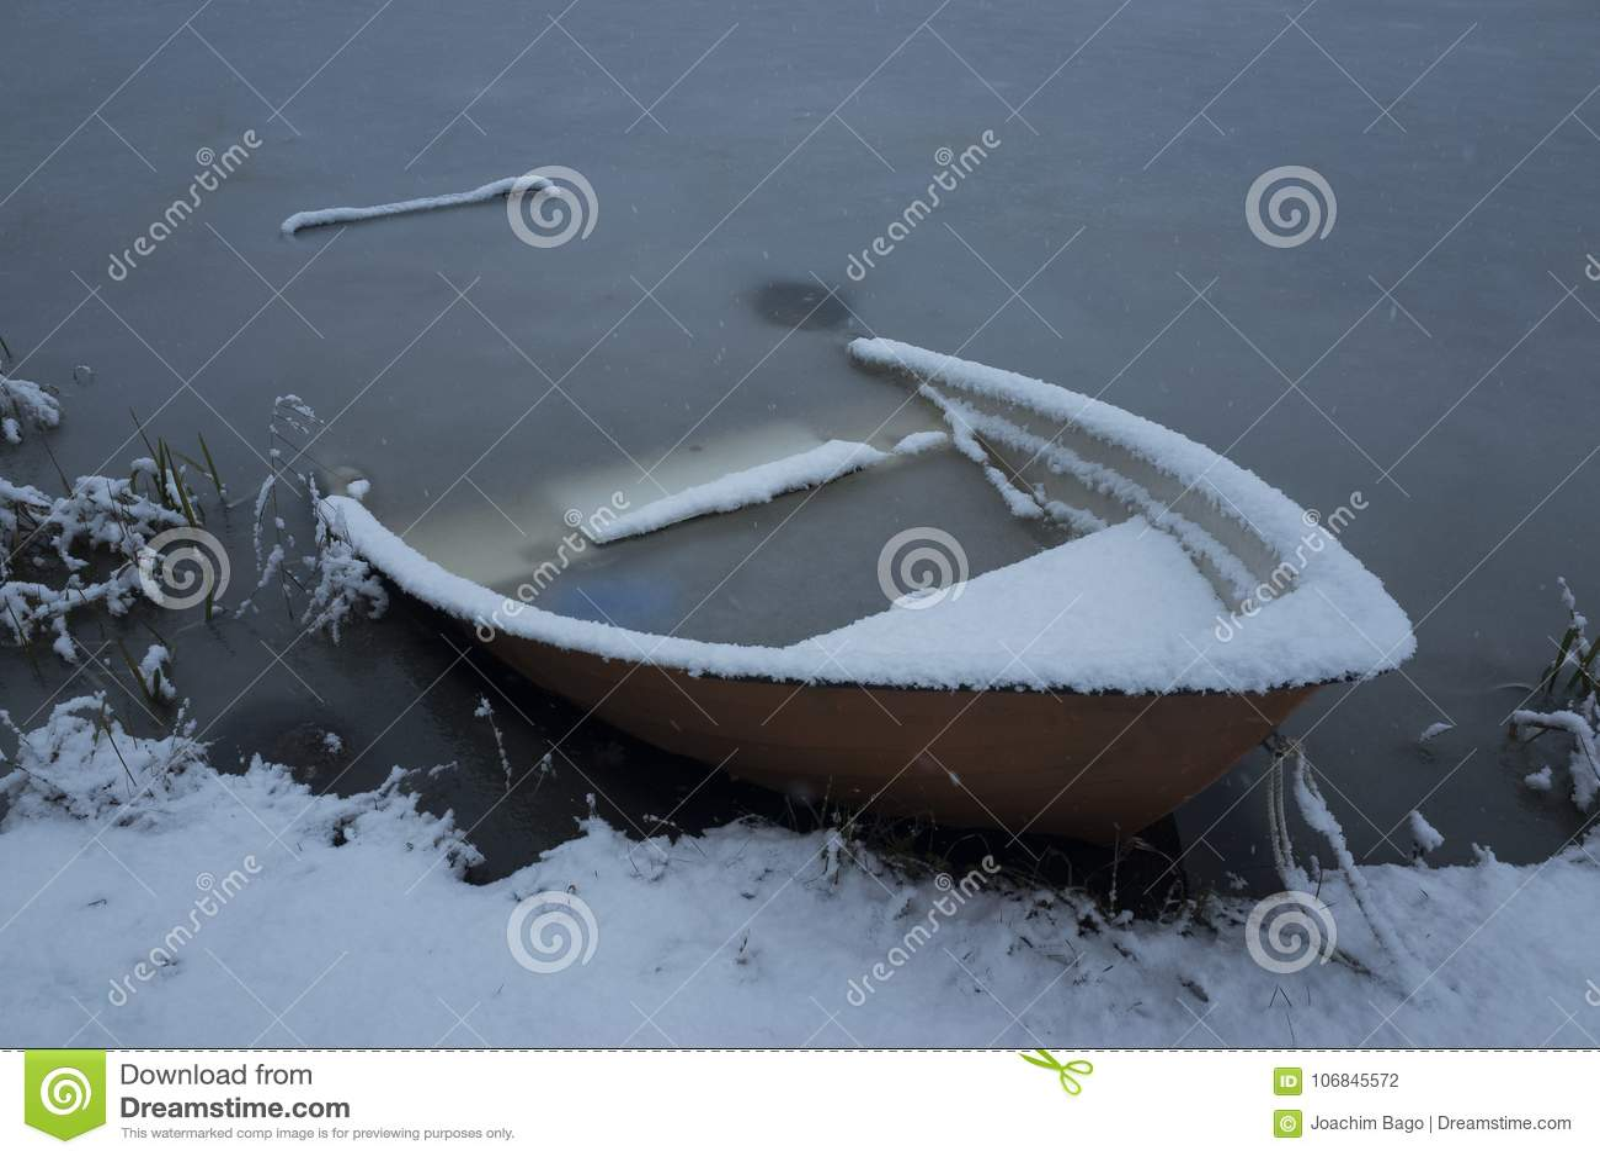 Nice details photo of frosty snowy boat frozen in lake in Sweden Scandinavia at winter